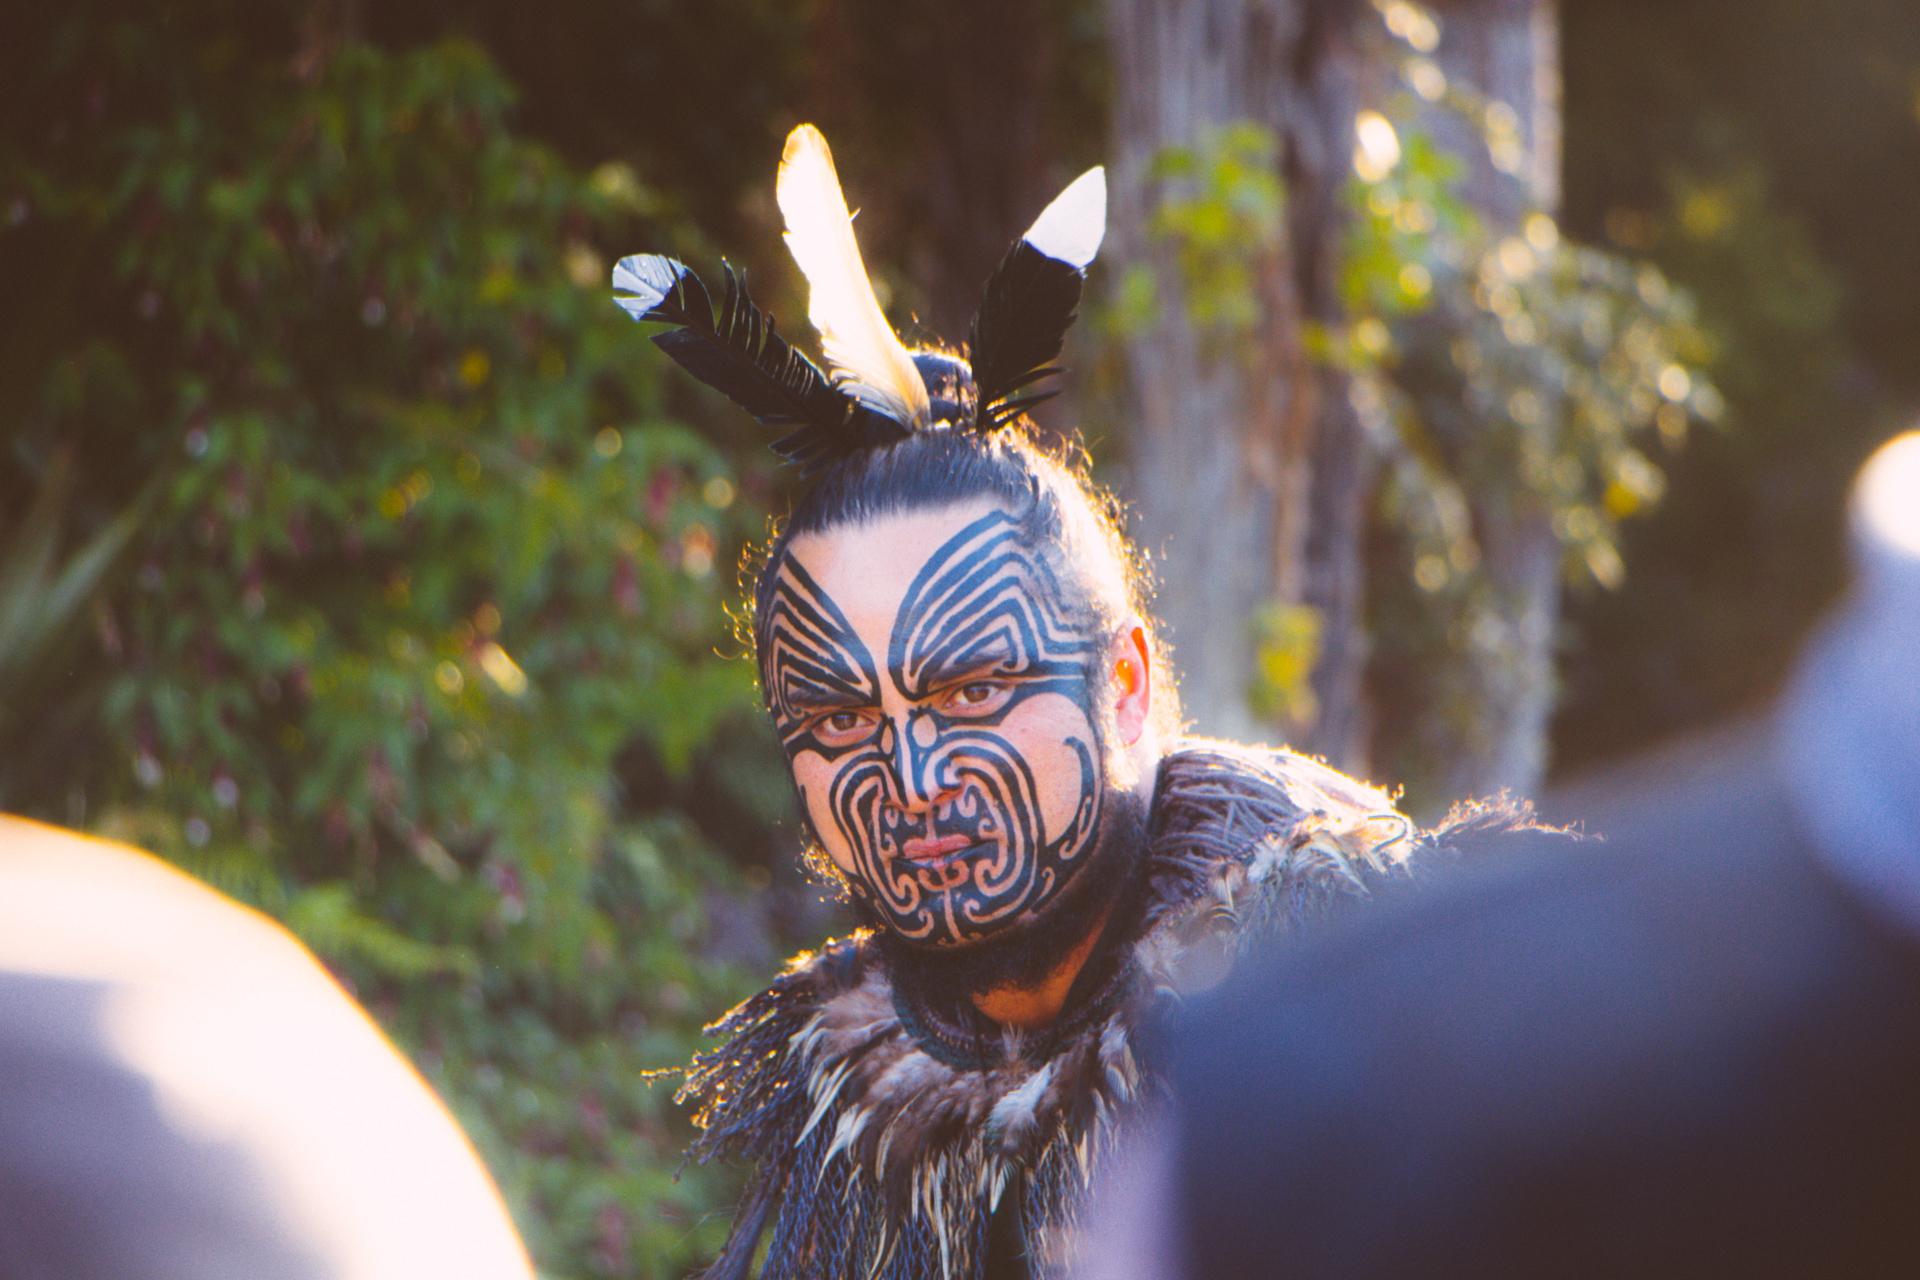 Tamaki Maori Village ceremony stare